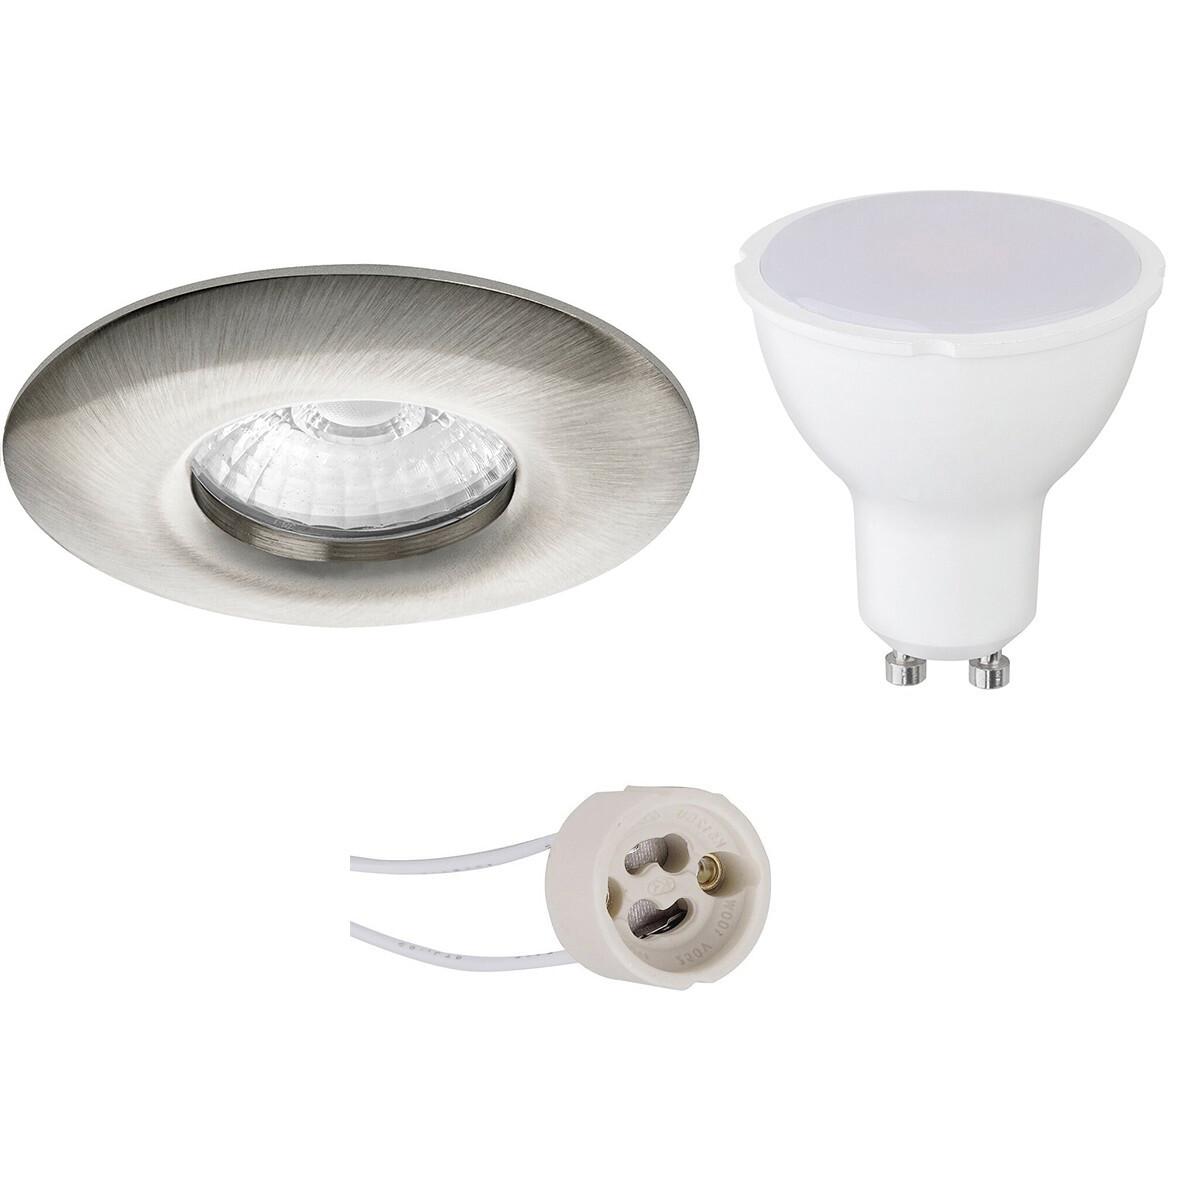 LED Spot Set - Aigi - Pragmi Luno Pro - Waterdicht IP65 - GU10 Fitting - Inbouw Rond - Mat Nikkel -